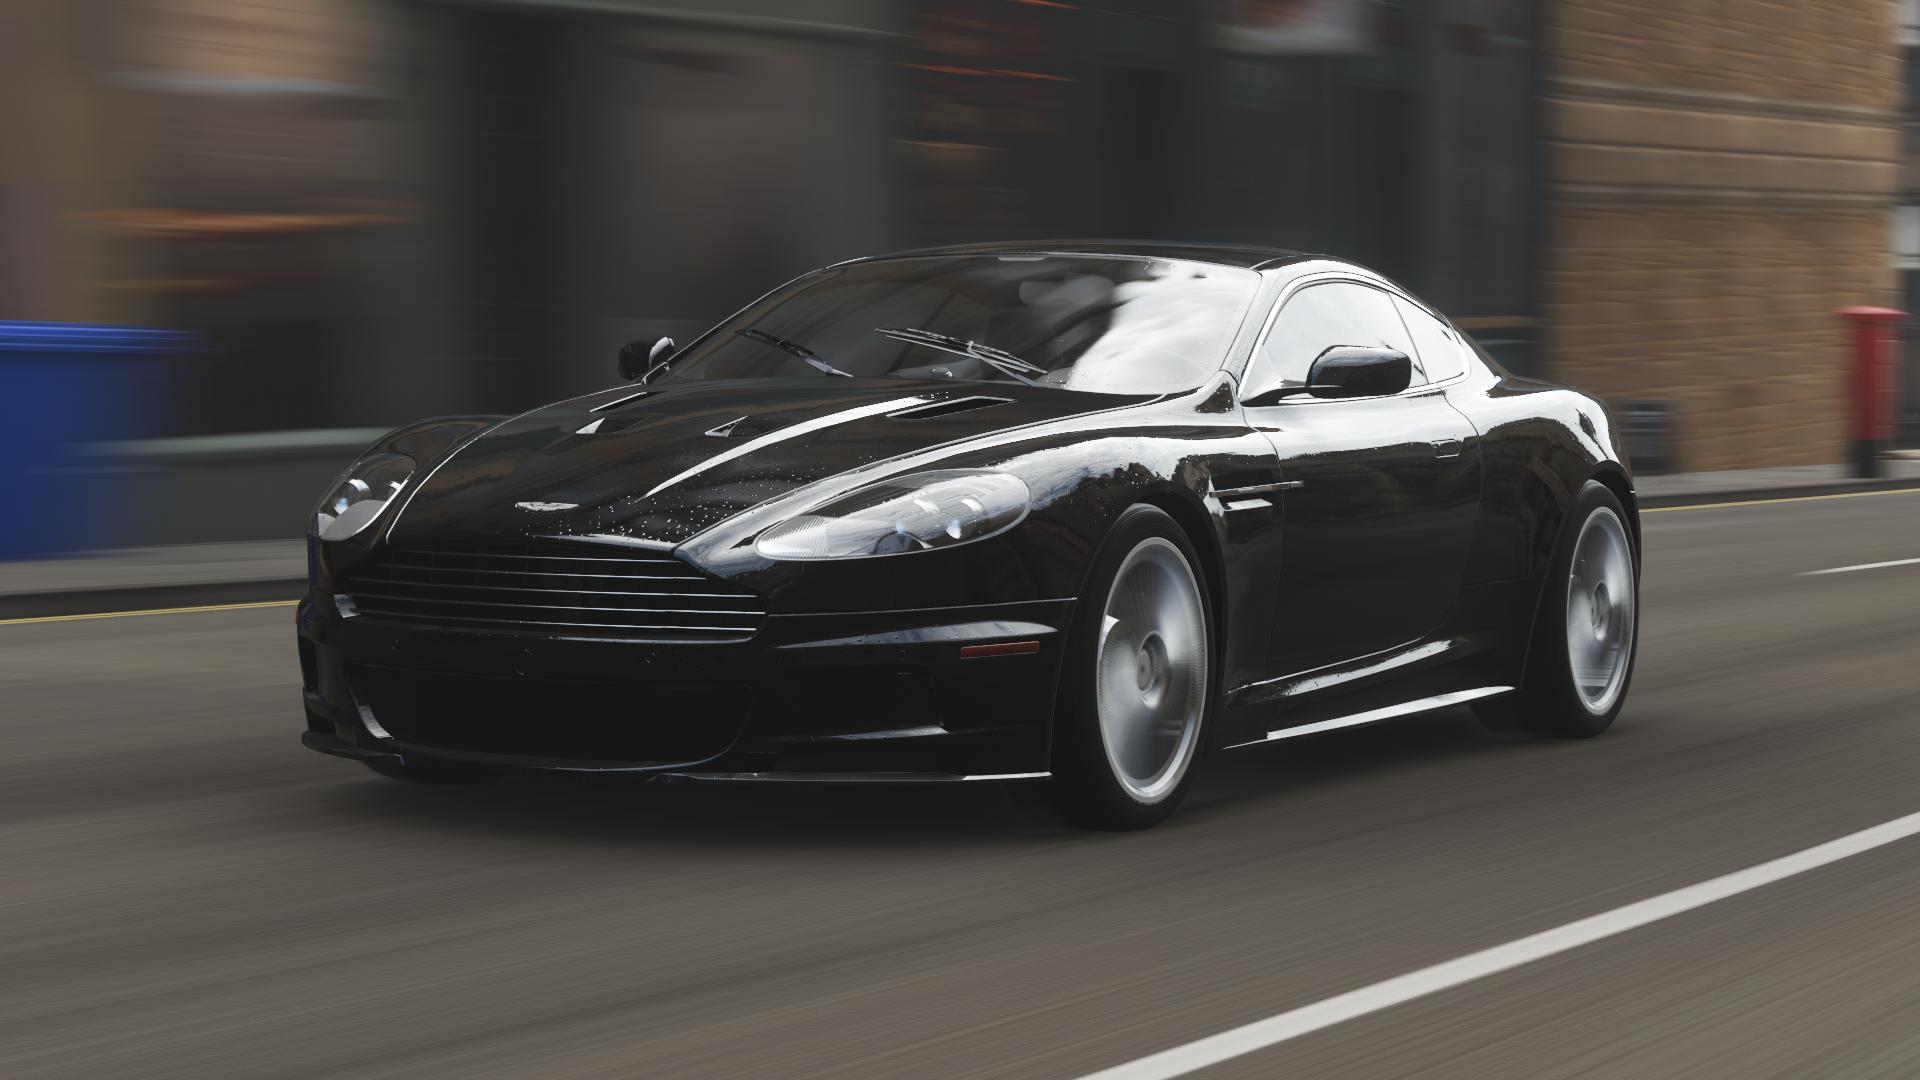 Car Aston Martin Black Cars Vehicle Motion Blur Wallpaper Resolution 1920x1080 Id 1121773 Wallha Com